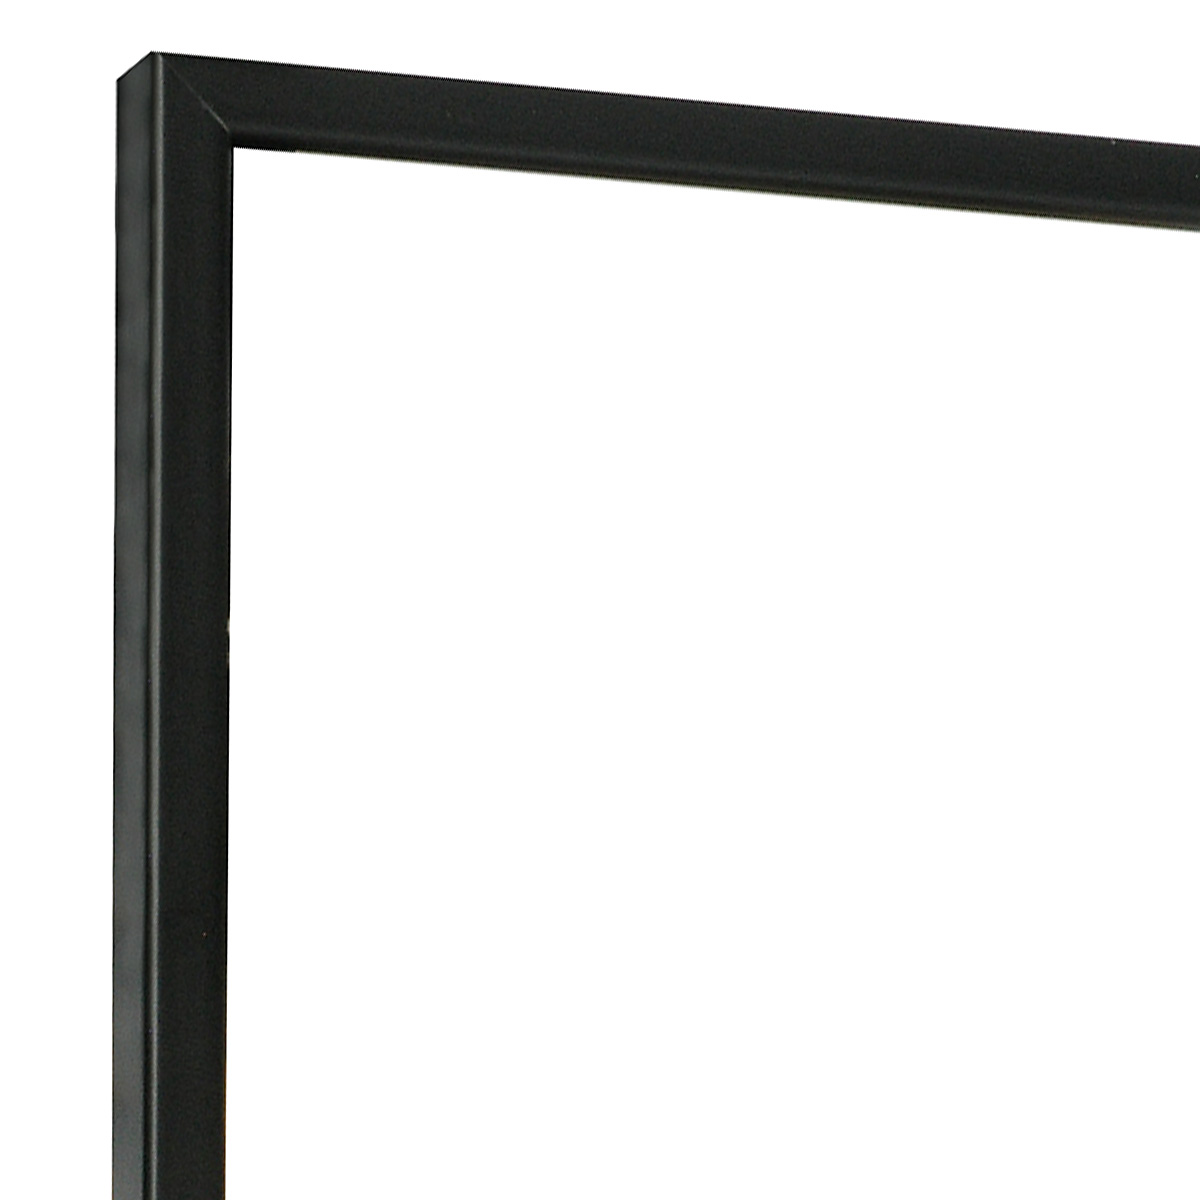 Moulding ramin width 10mm height 14 - matt black